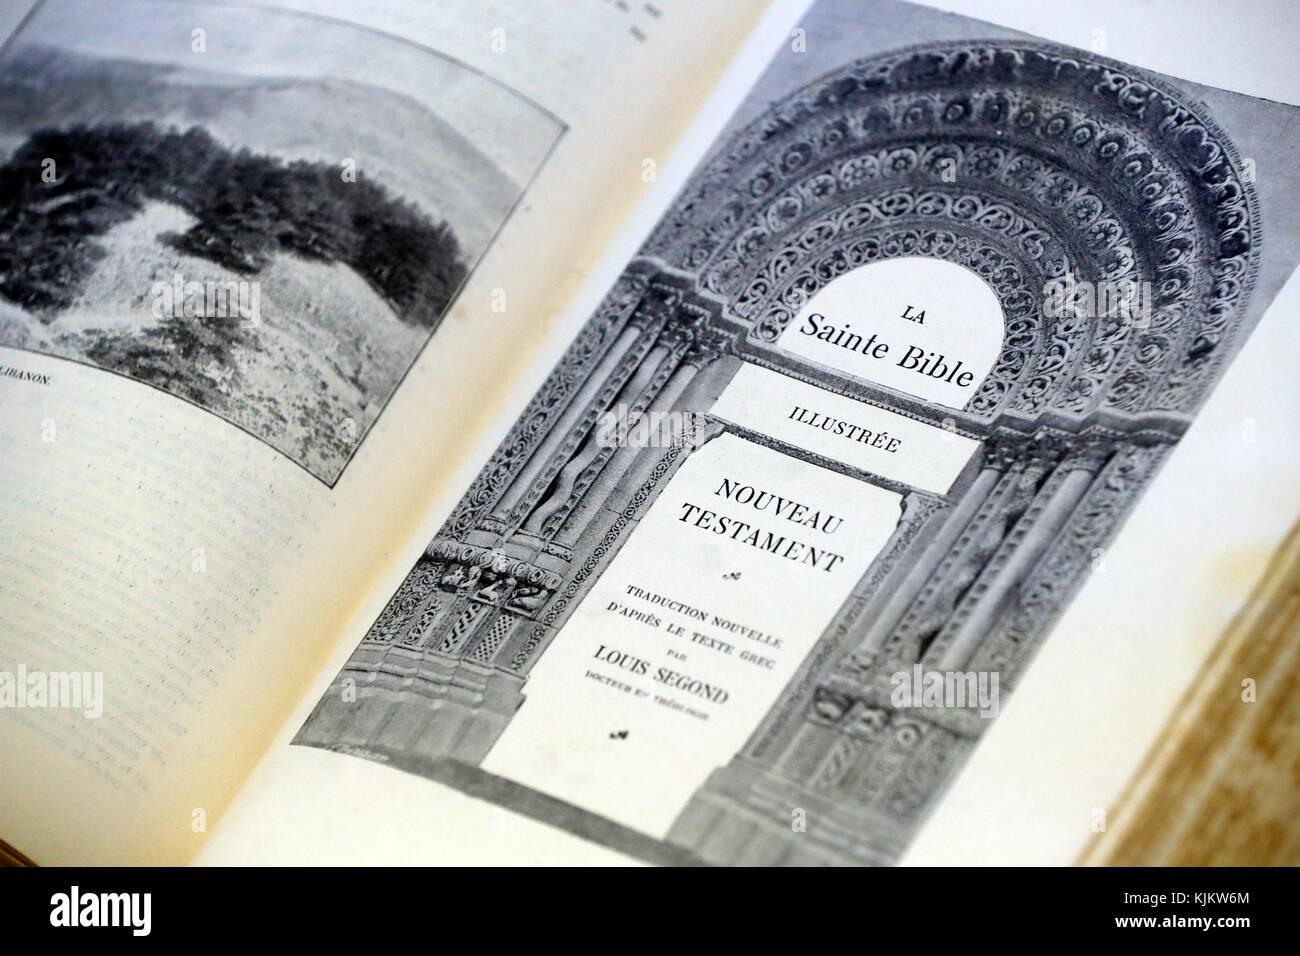 Eglise Protestante EvangŽlique Libre de Cluses.  Bible ancienne. France.  Protestant church. Old Holy Bible.  Cluses. - Stock Image